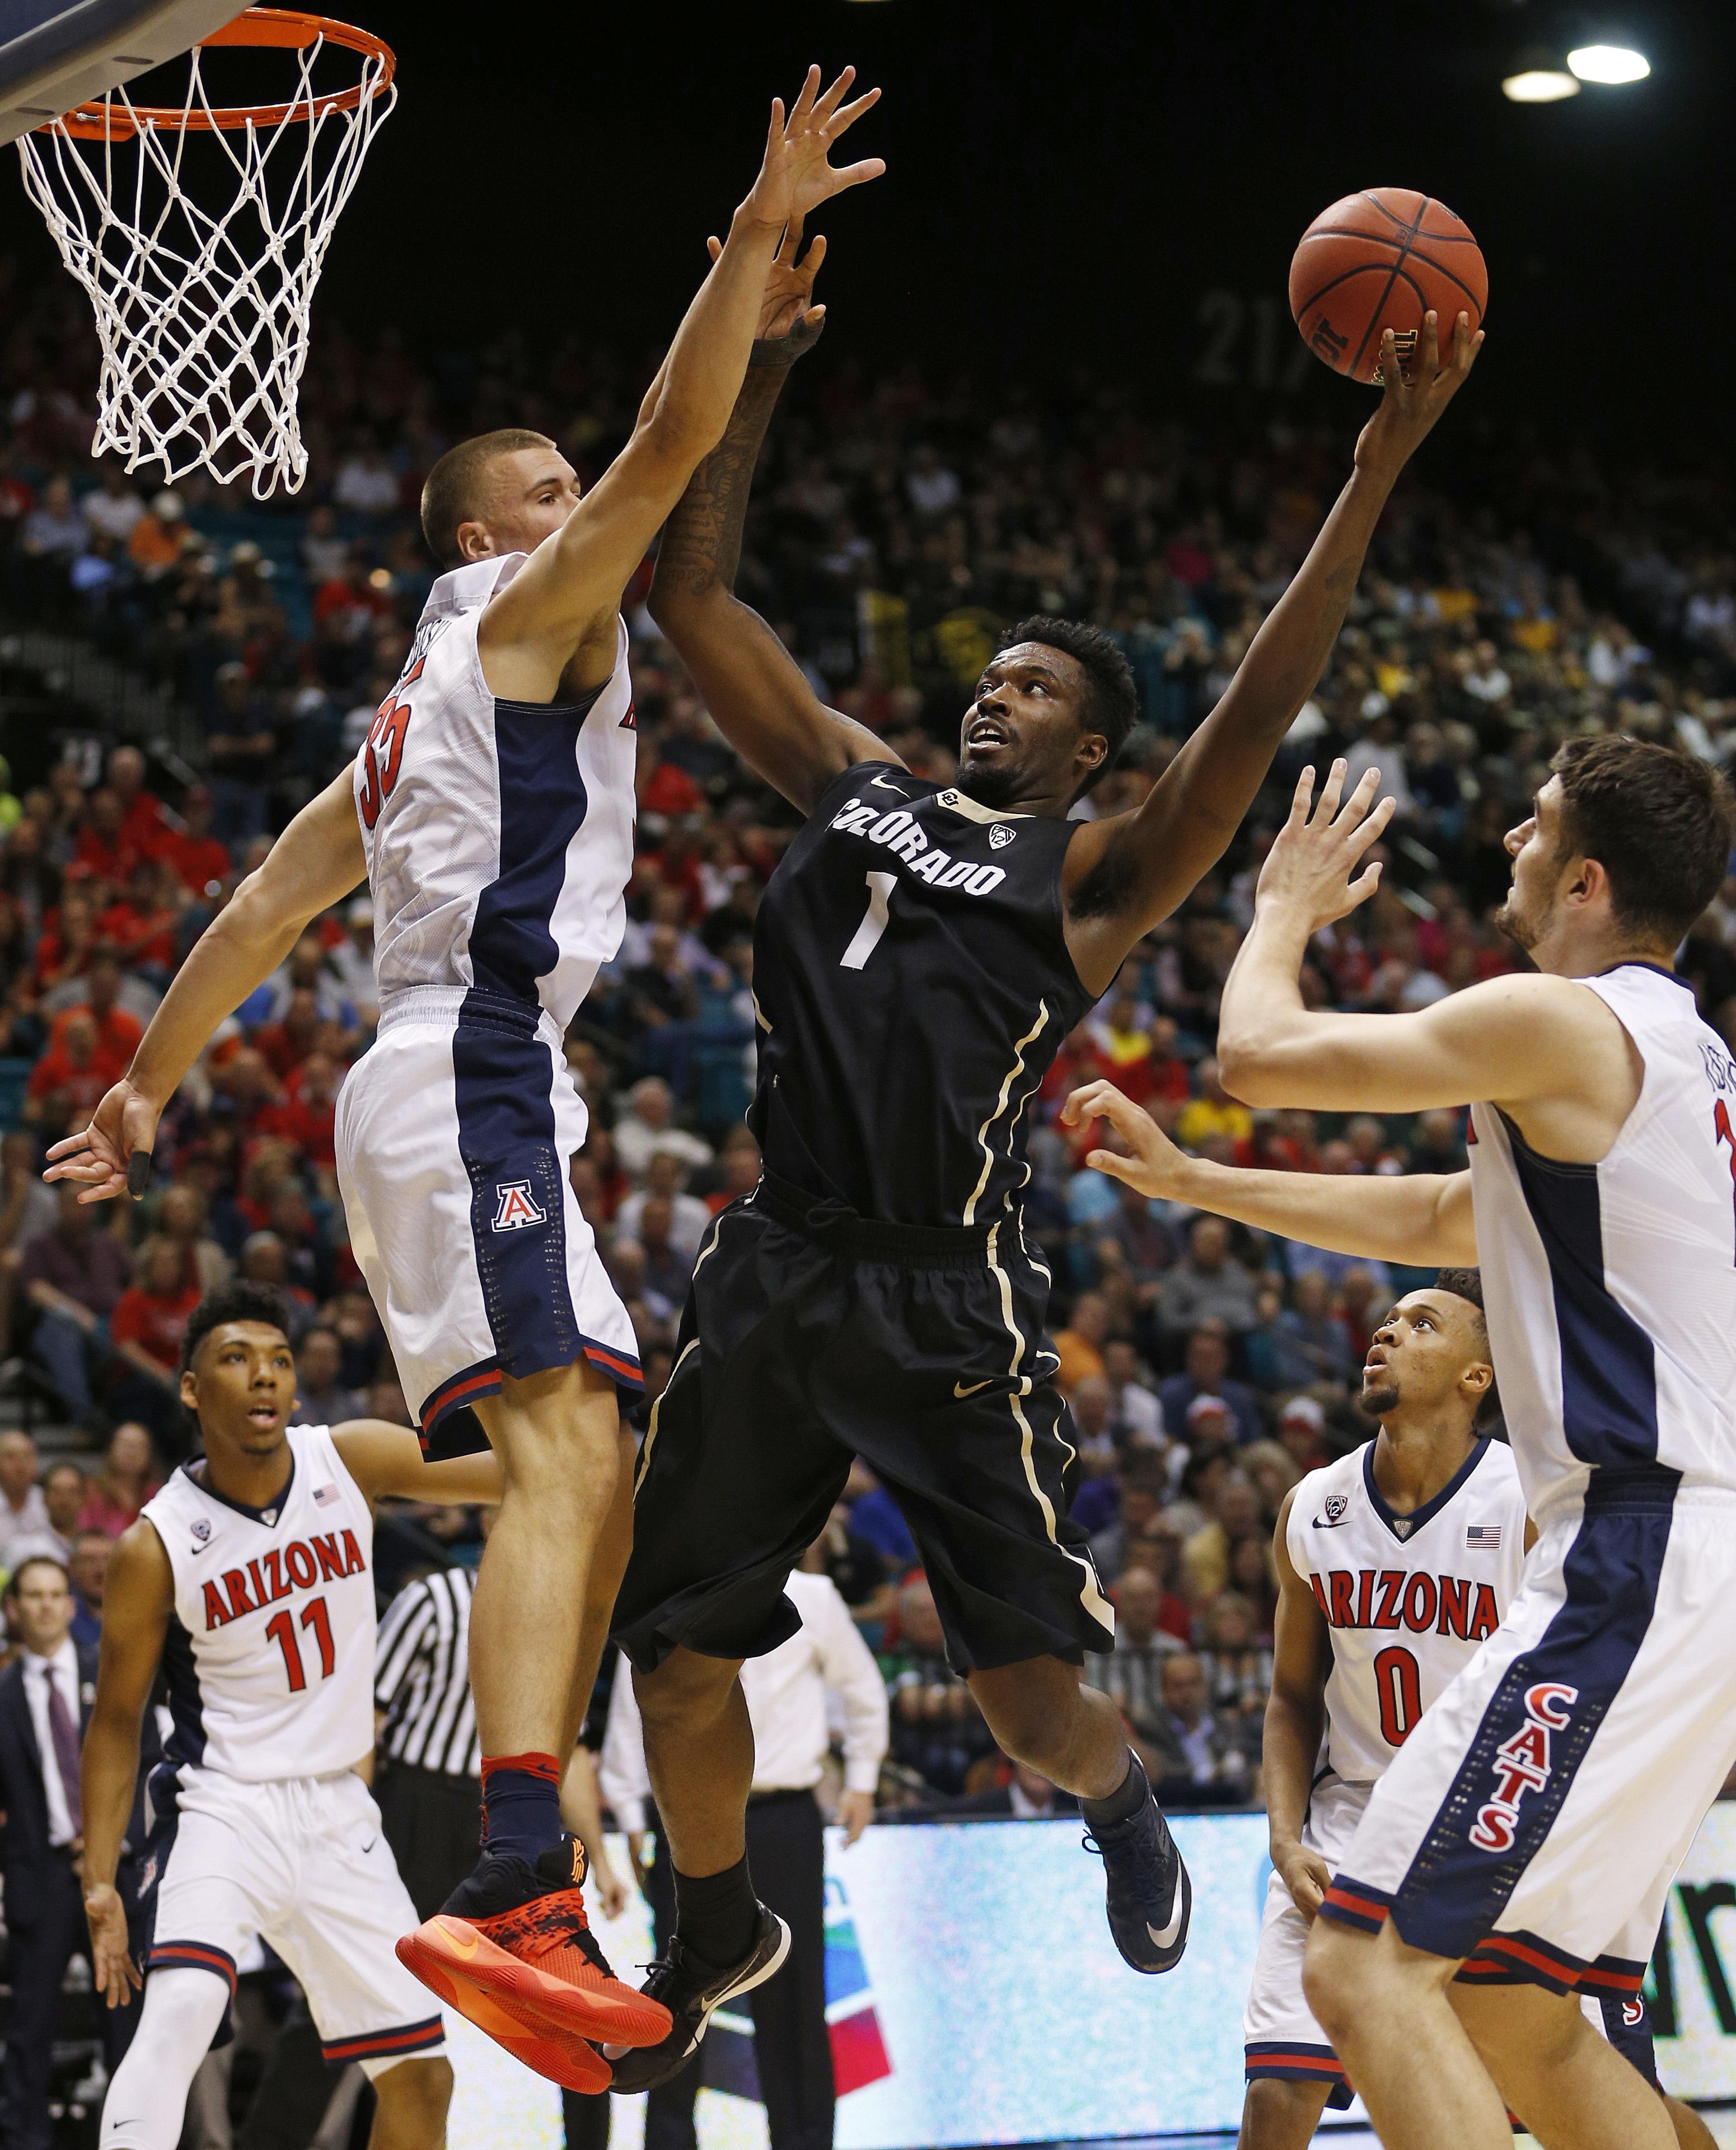 Colorado forward Wesley Gordon (1) shoots around Arizona center Kaleb Tarczewski, left, during the first half of an NCAA college basketball game in the quarterfinal round of the Pac-12 men's tournament Thursday, March 10, 2016, in Las Vegas. (AP Photo/Joh